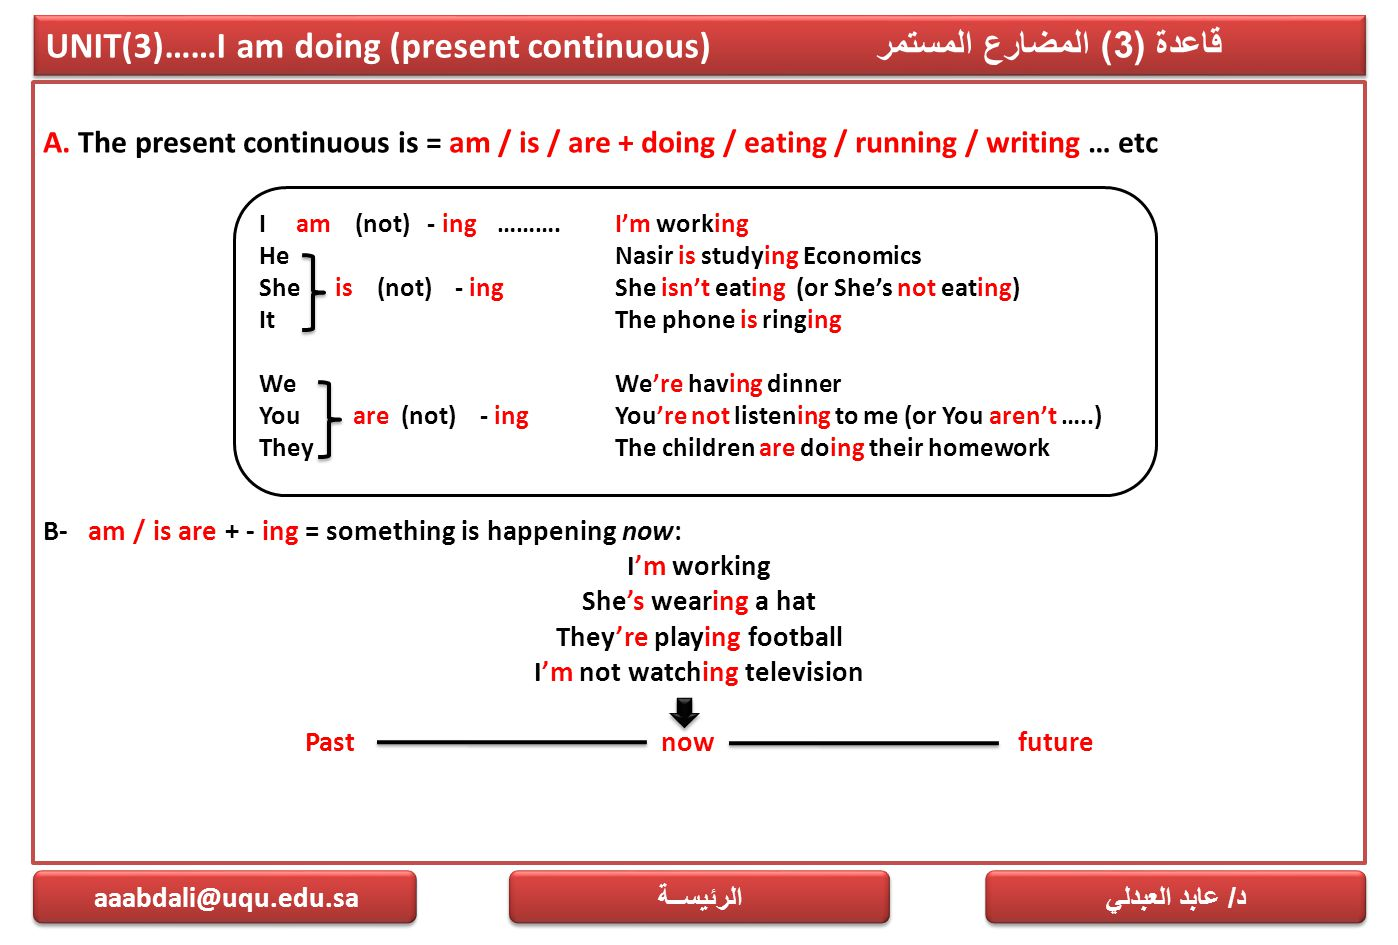 UNIT(3)……I am doing (present continuous) قاعدة (3) المضارع المستمر